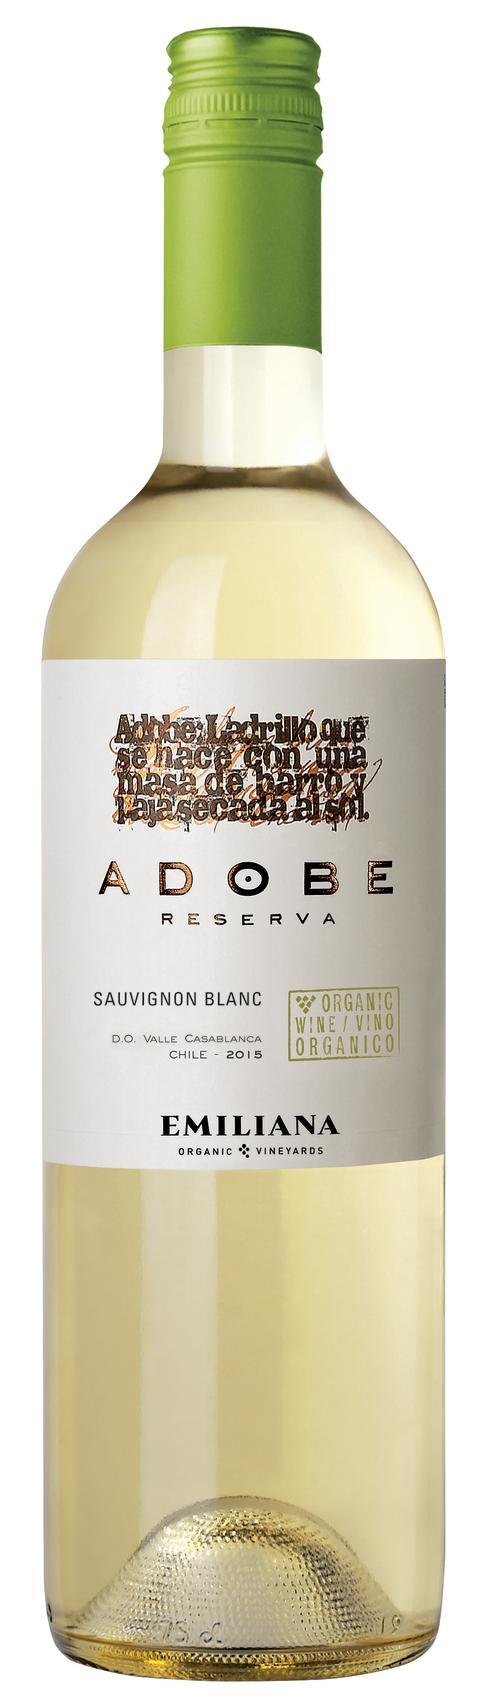 Adobe Savignon Blanc